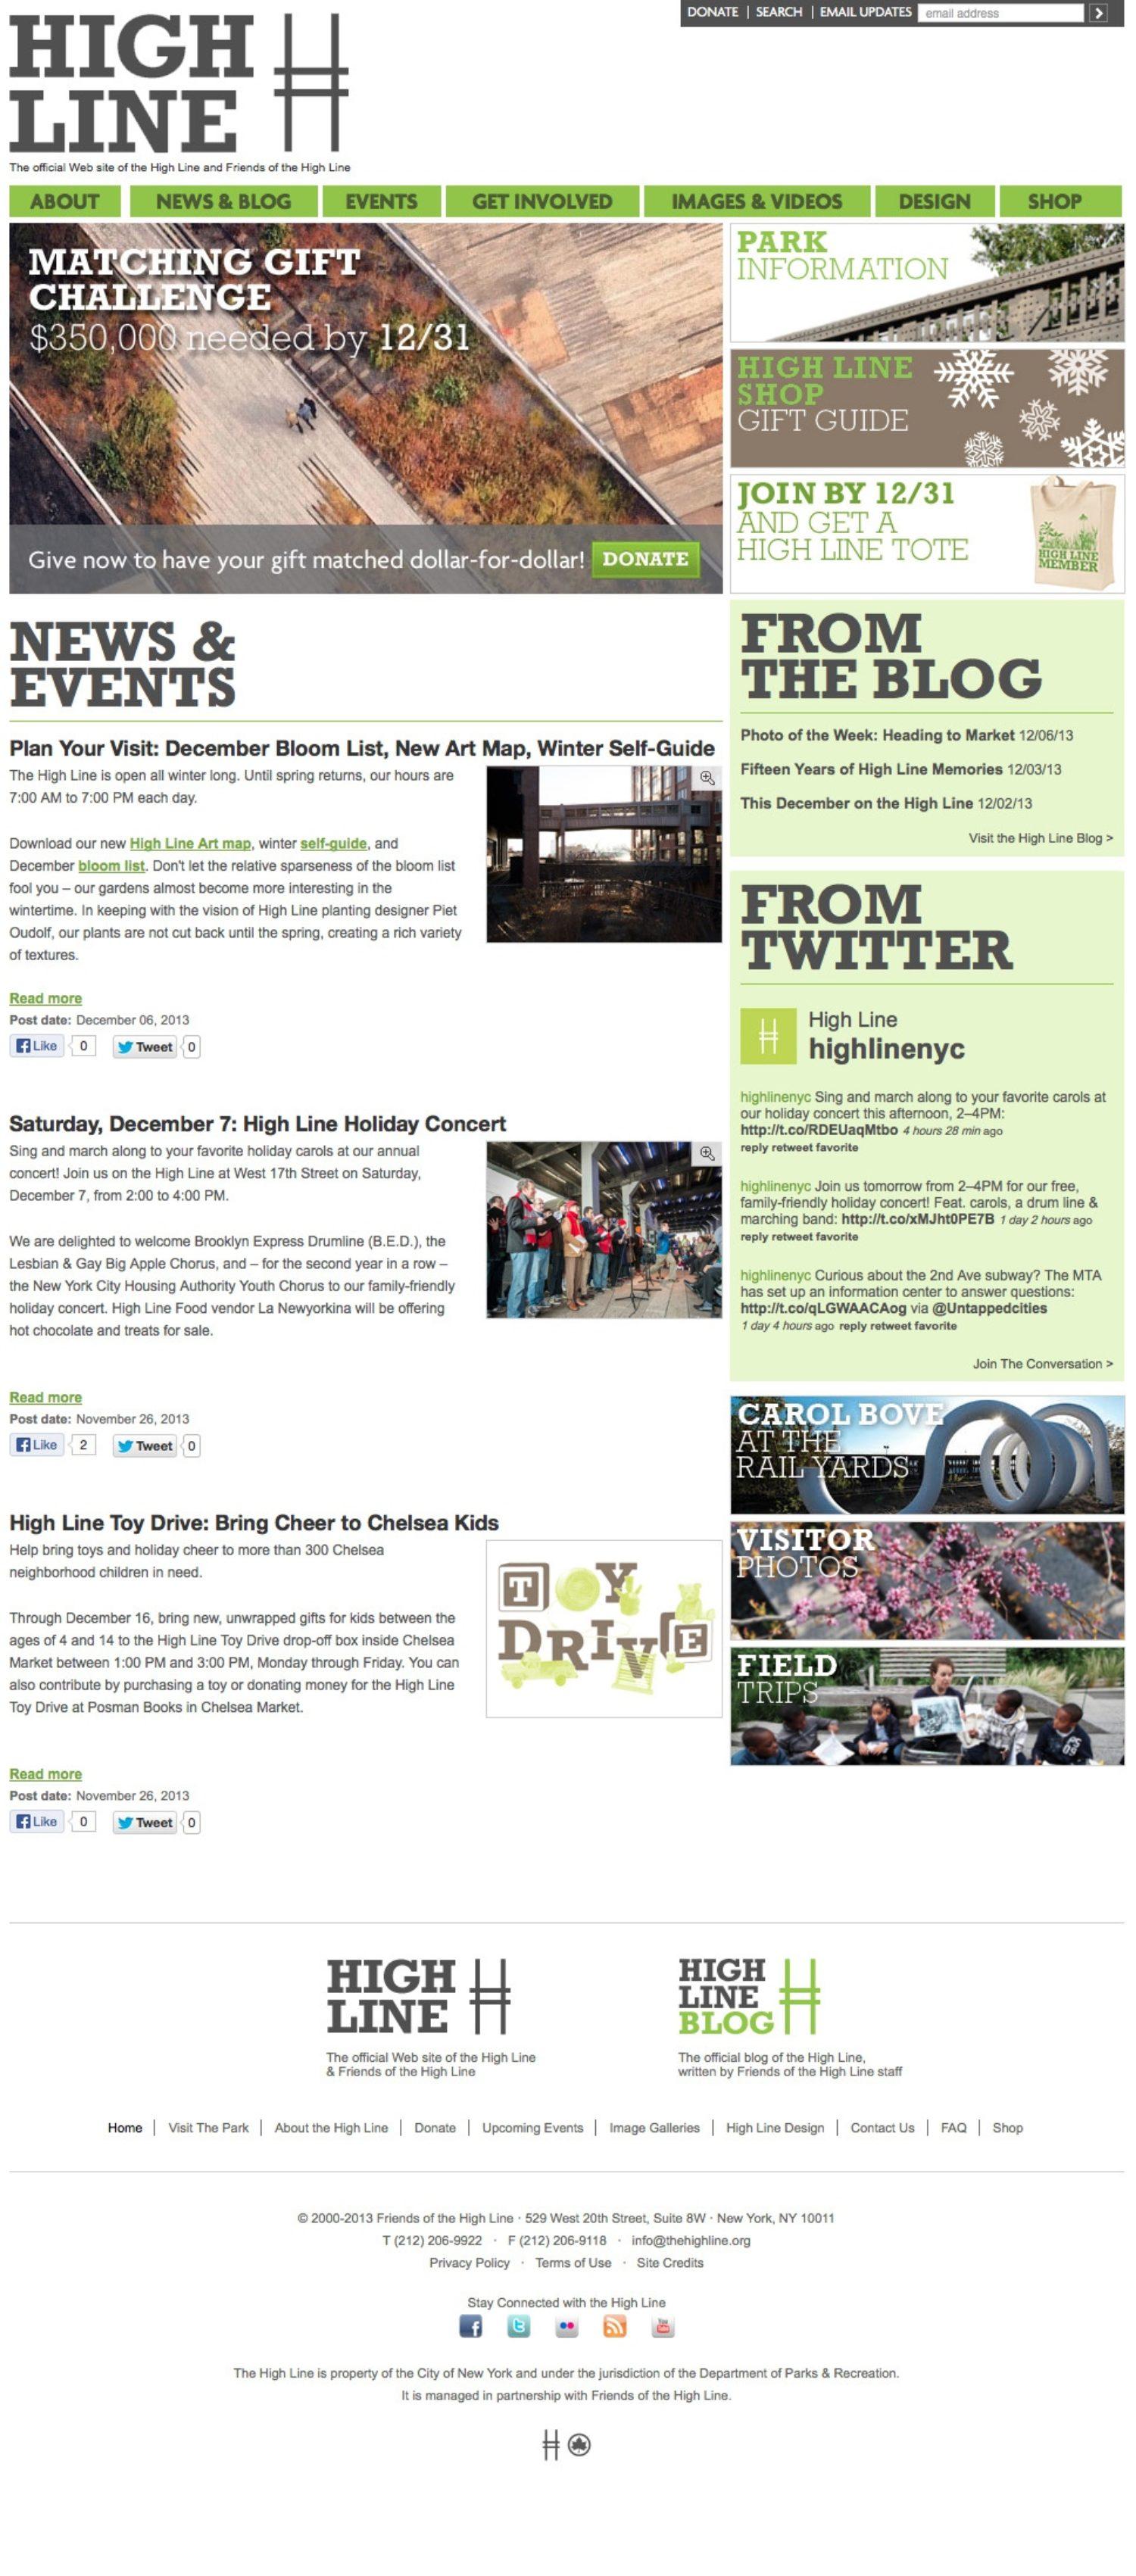 Screenshot of the High Line website's homepage